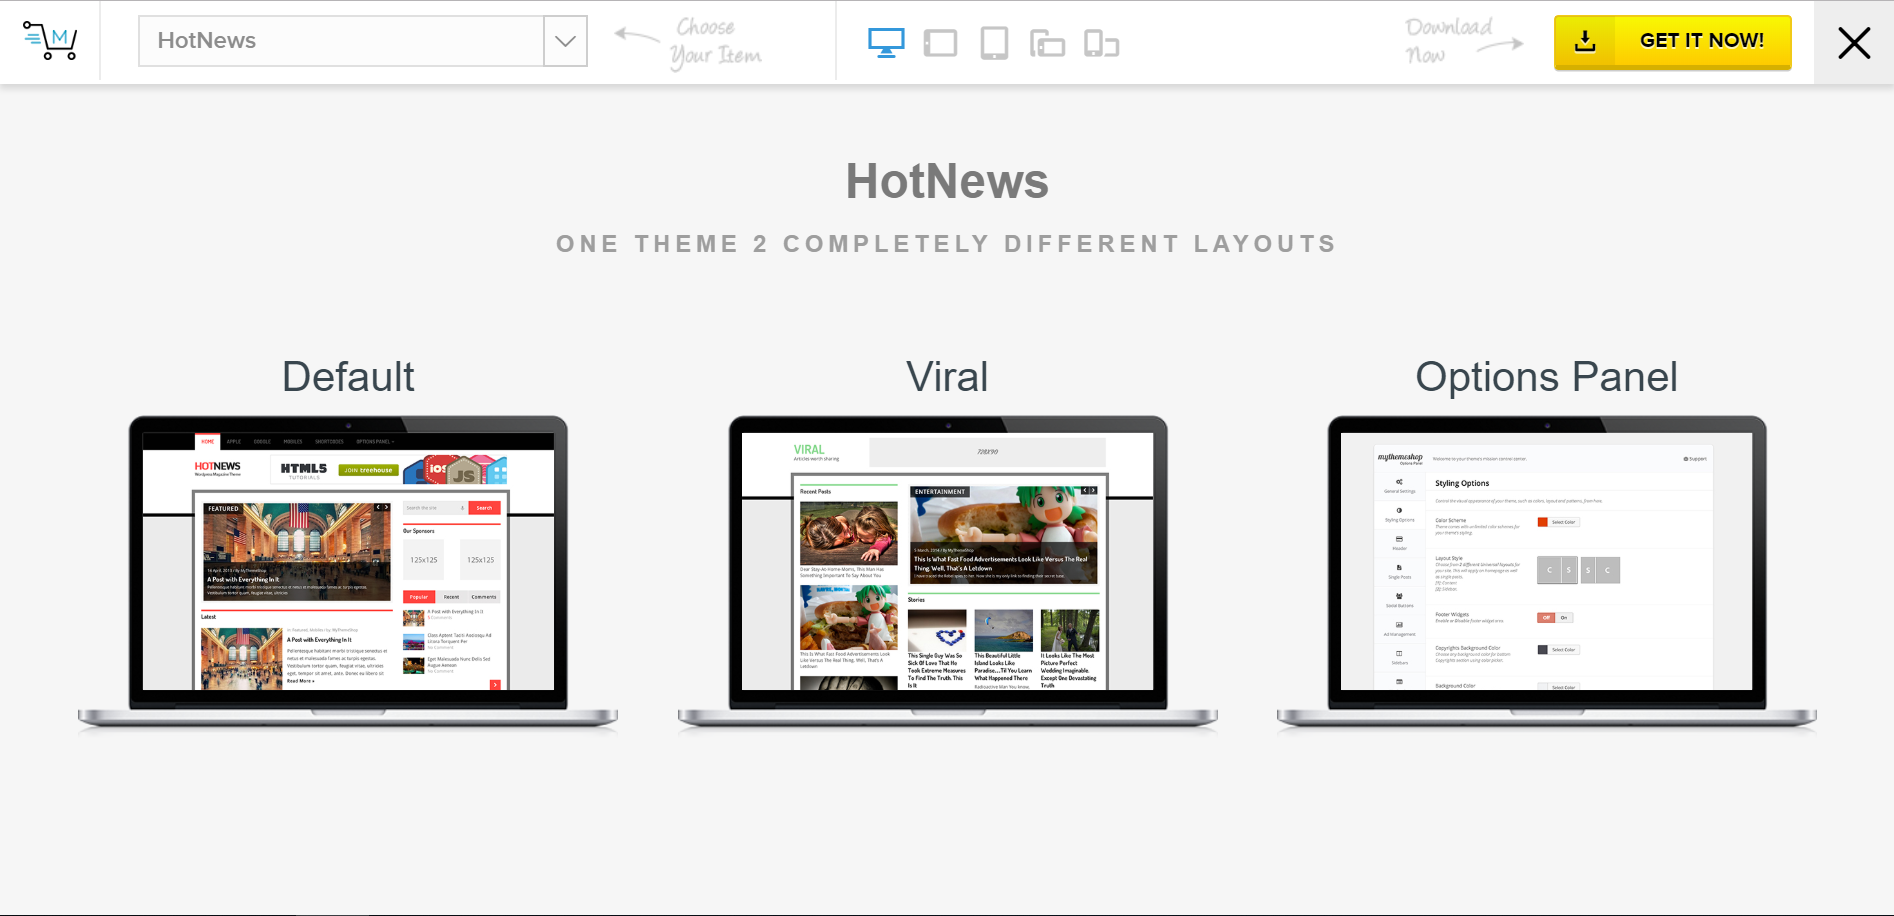 HotNews theme